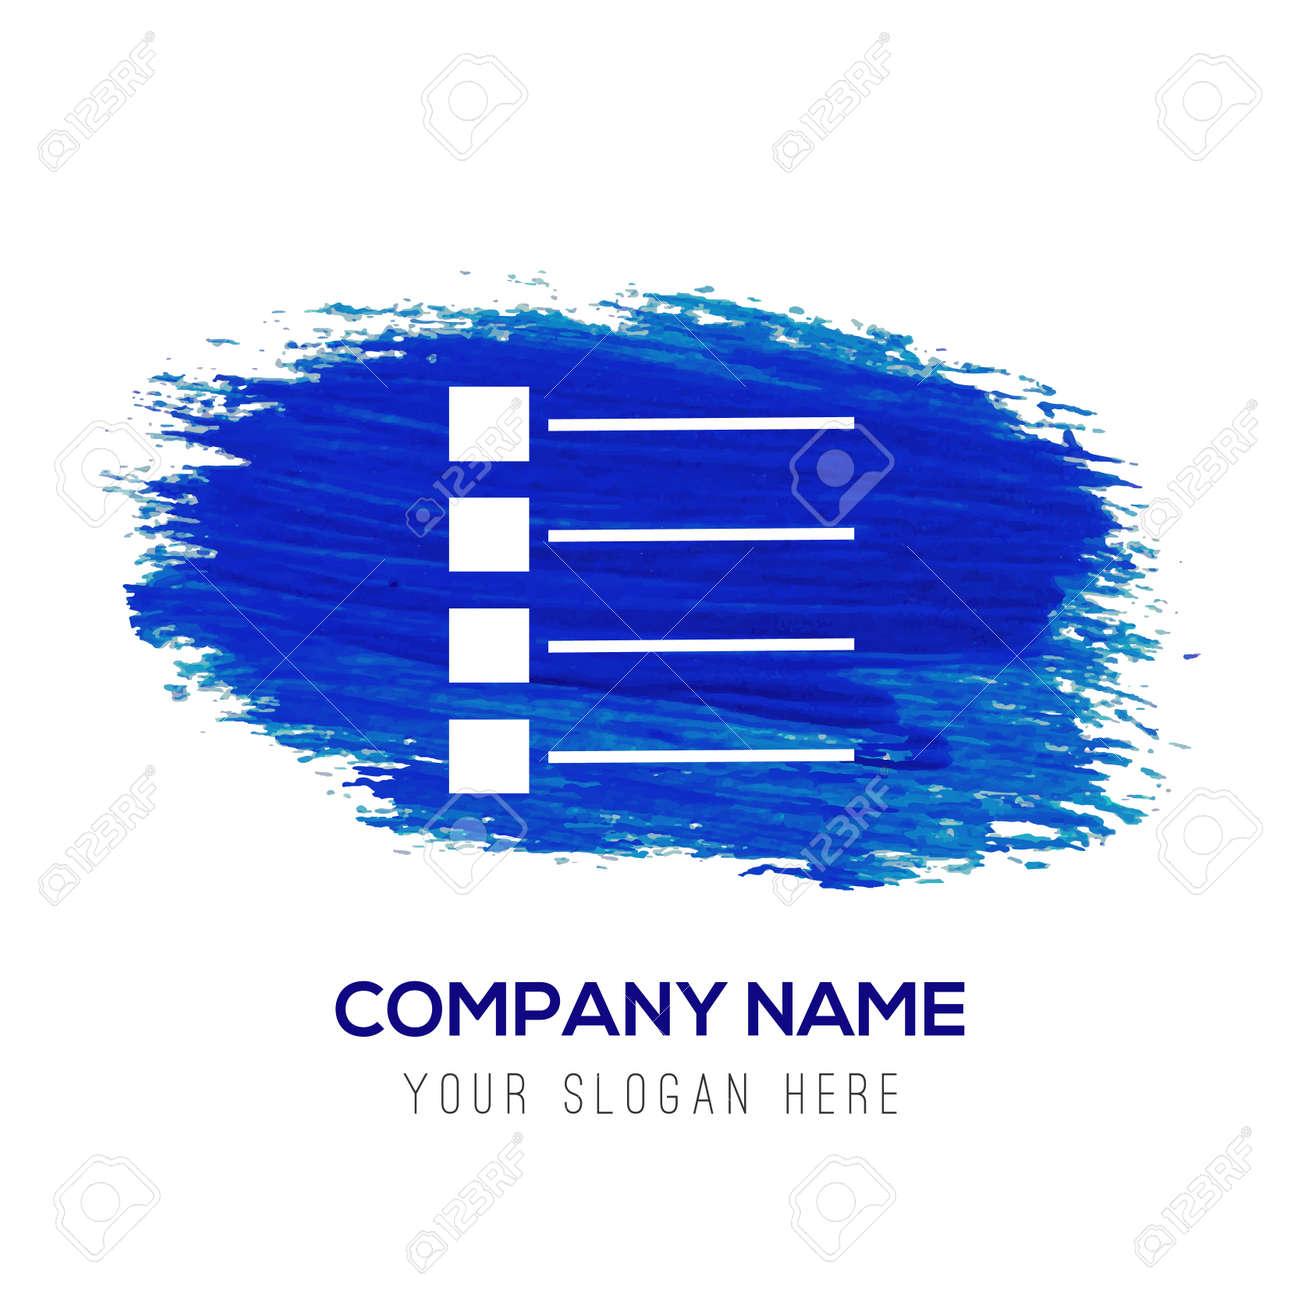 menu icon - Blue watercolor background - 122160181